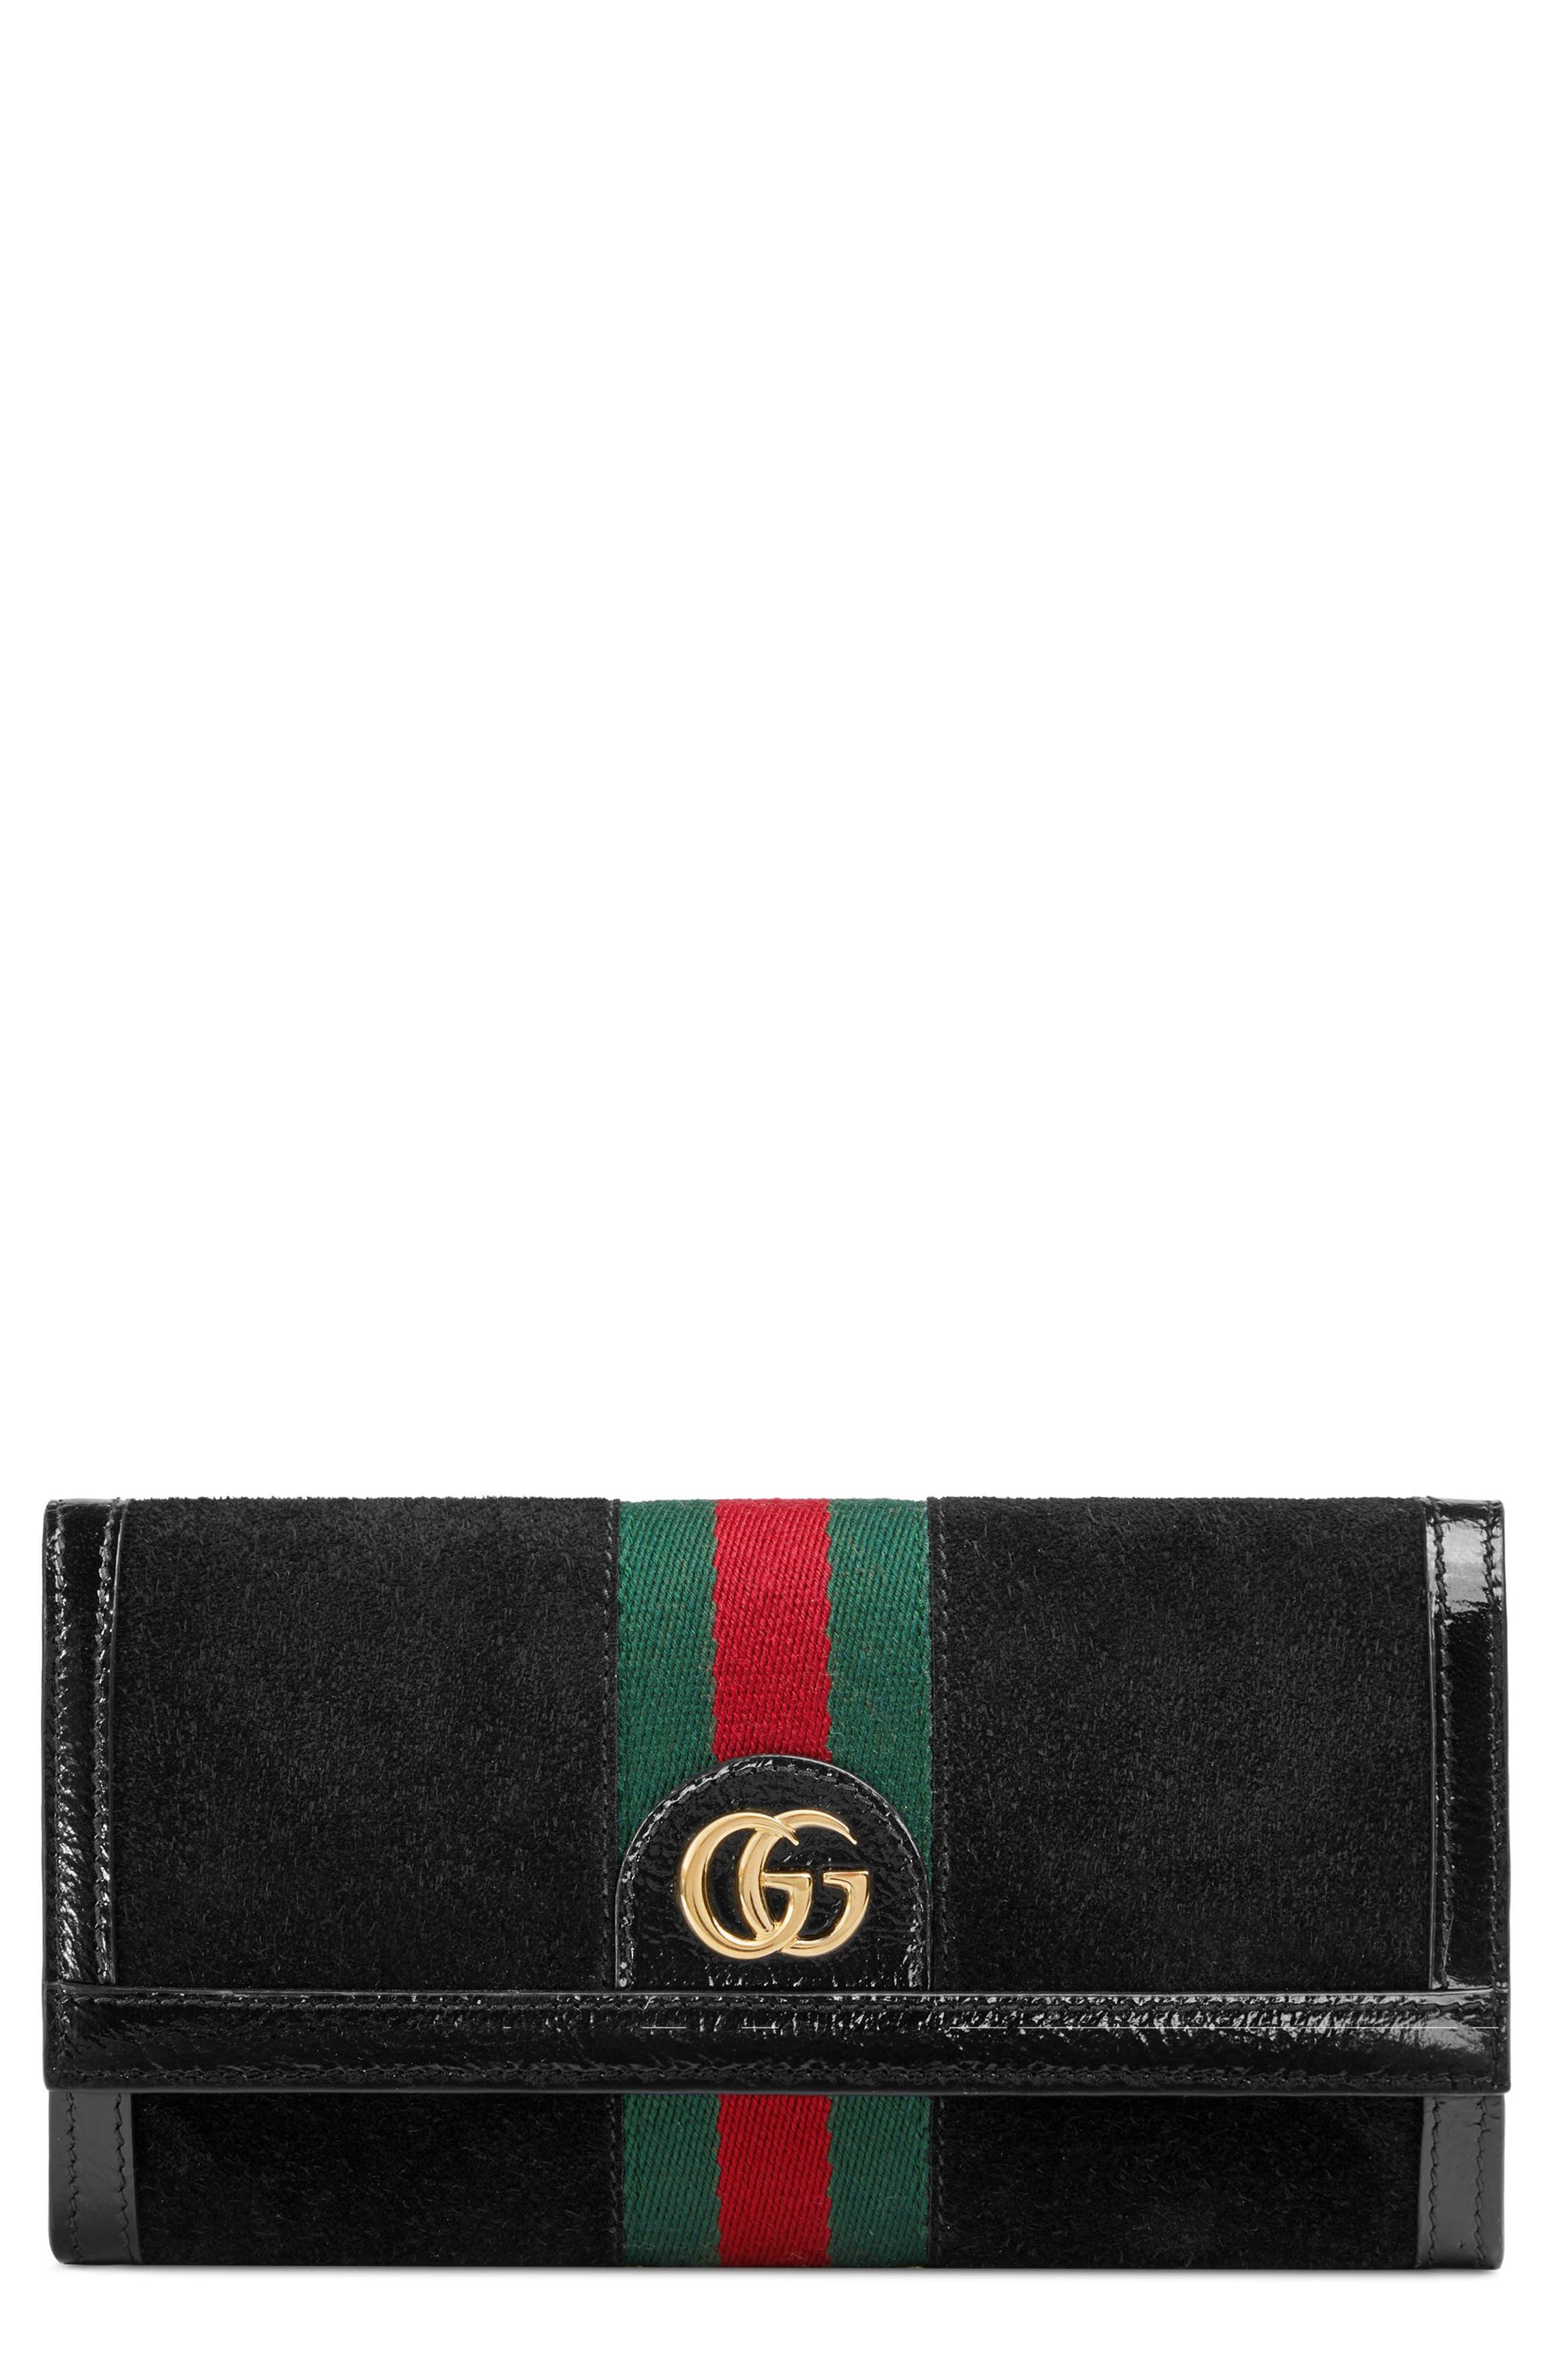 Ophidia Suede Continental Wallet,                         Main,                         color, Nero/ Nero/ Vert Red Vert